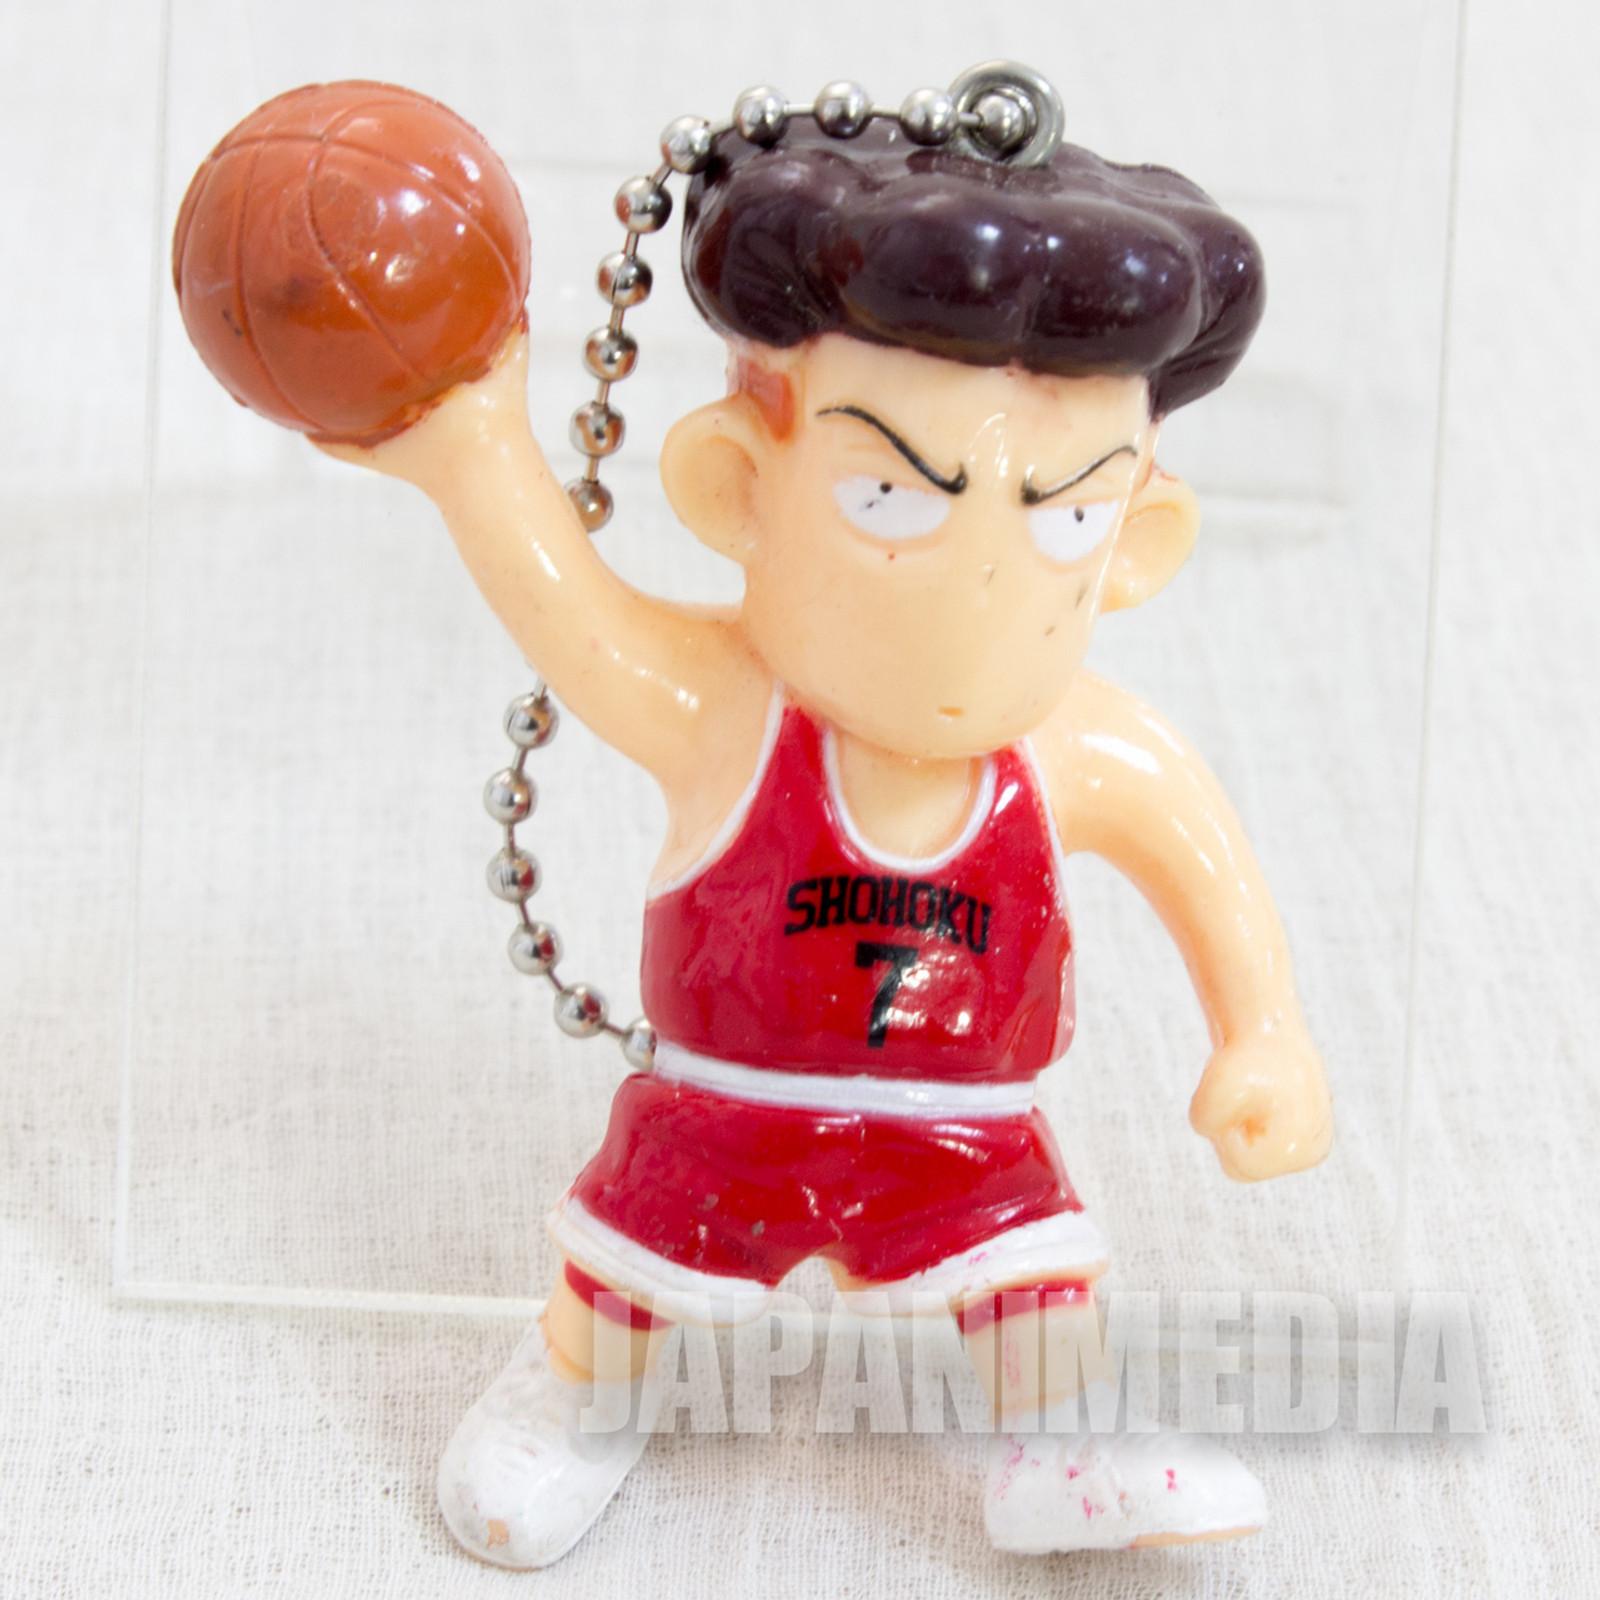 SLAM DUNK Ryota Miyagi Mini Figure Ball Key Chain JAPAN ANIME MANGA 2